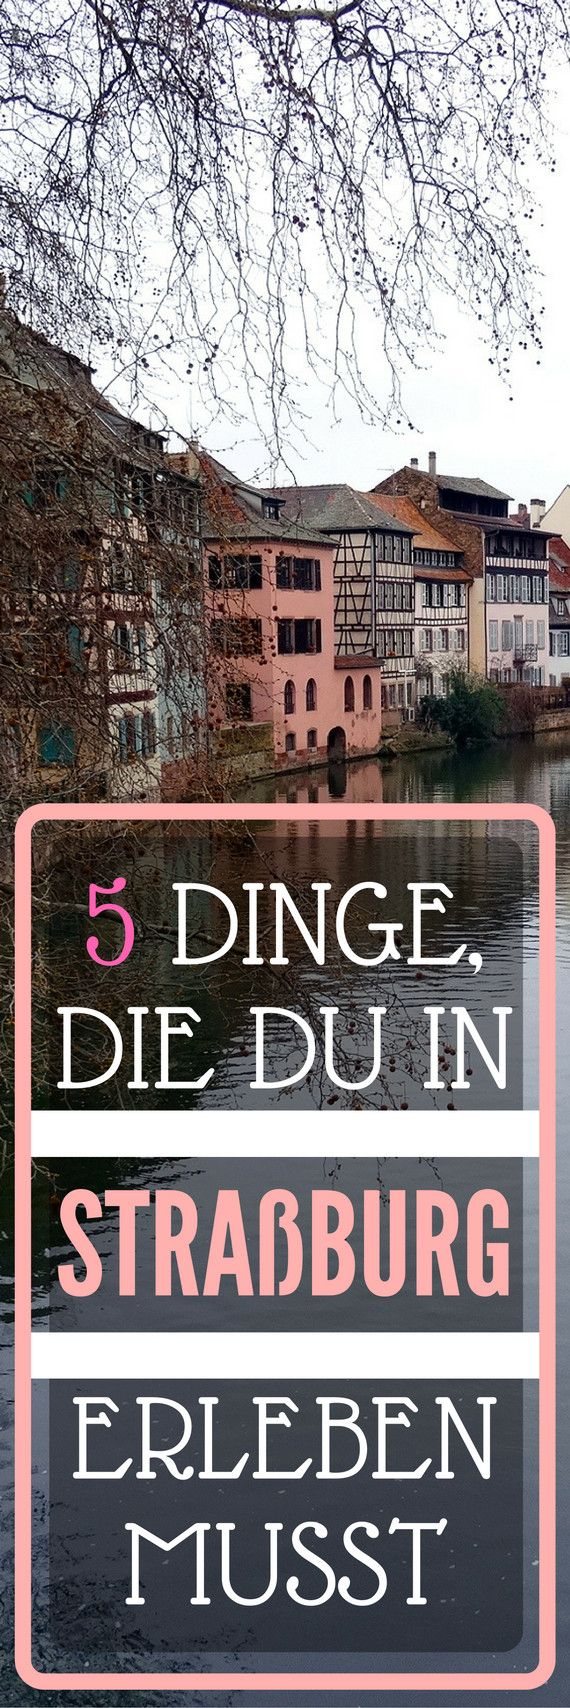 5 Dinge, die du in Straßburg erleben musst